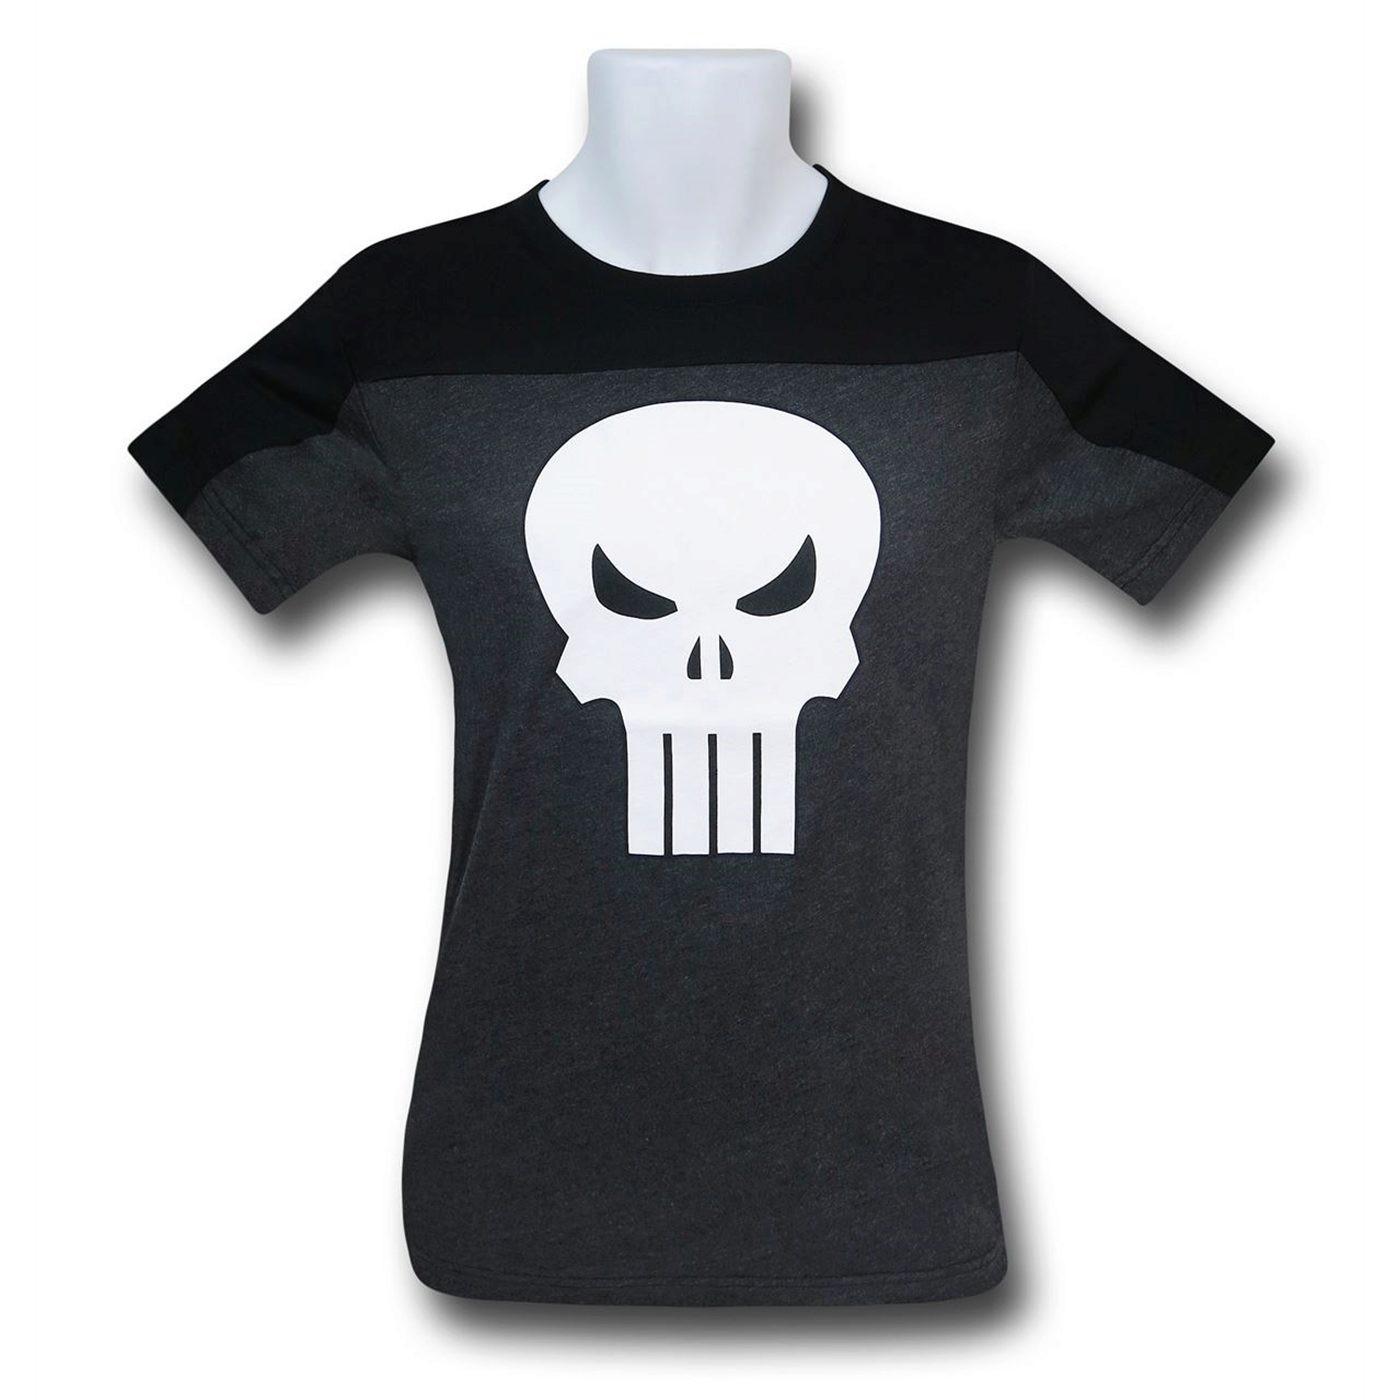 Punisher Symbol Two-Tone Men's T-Shirt